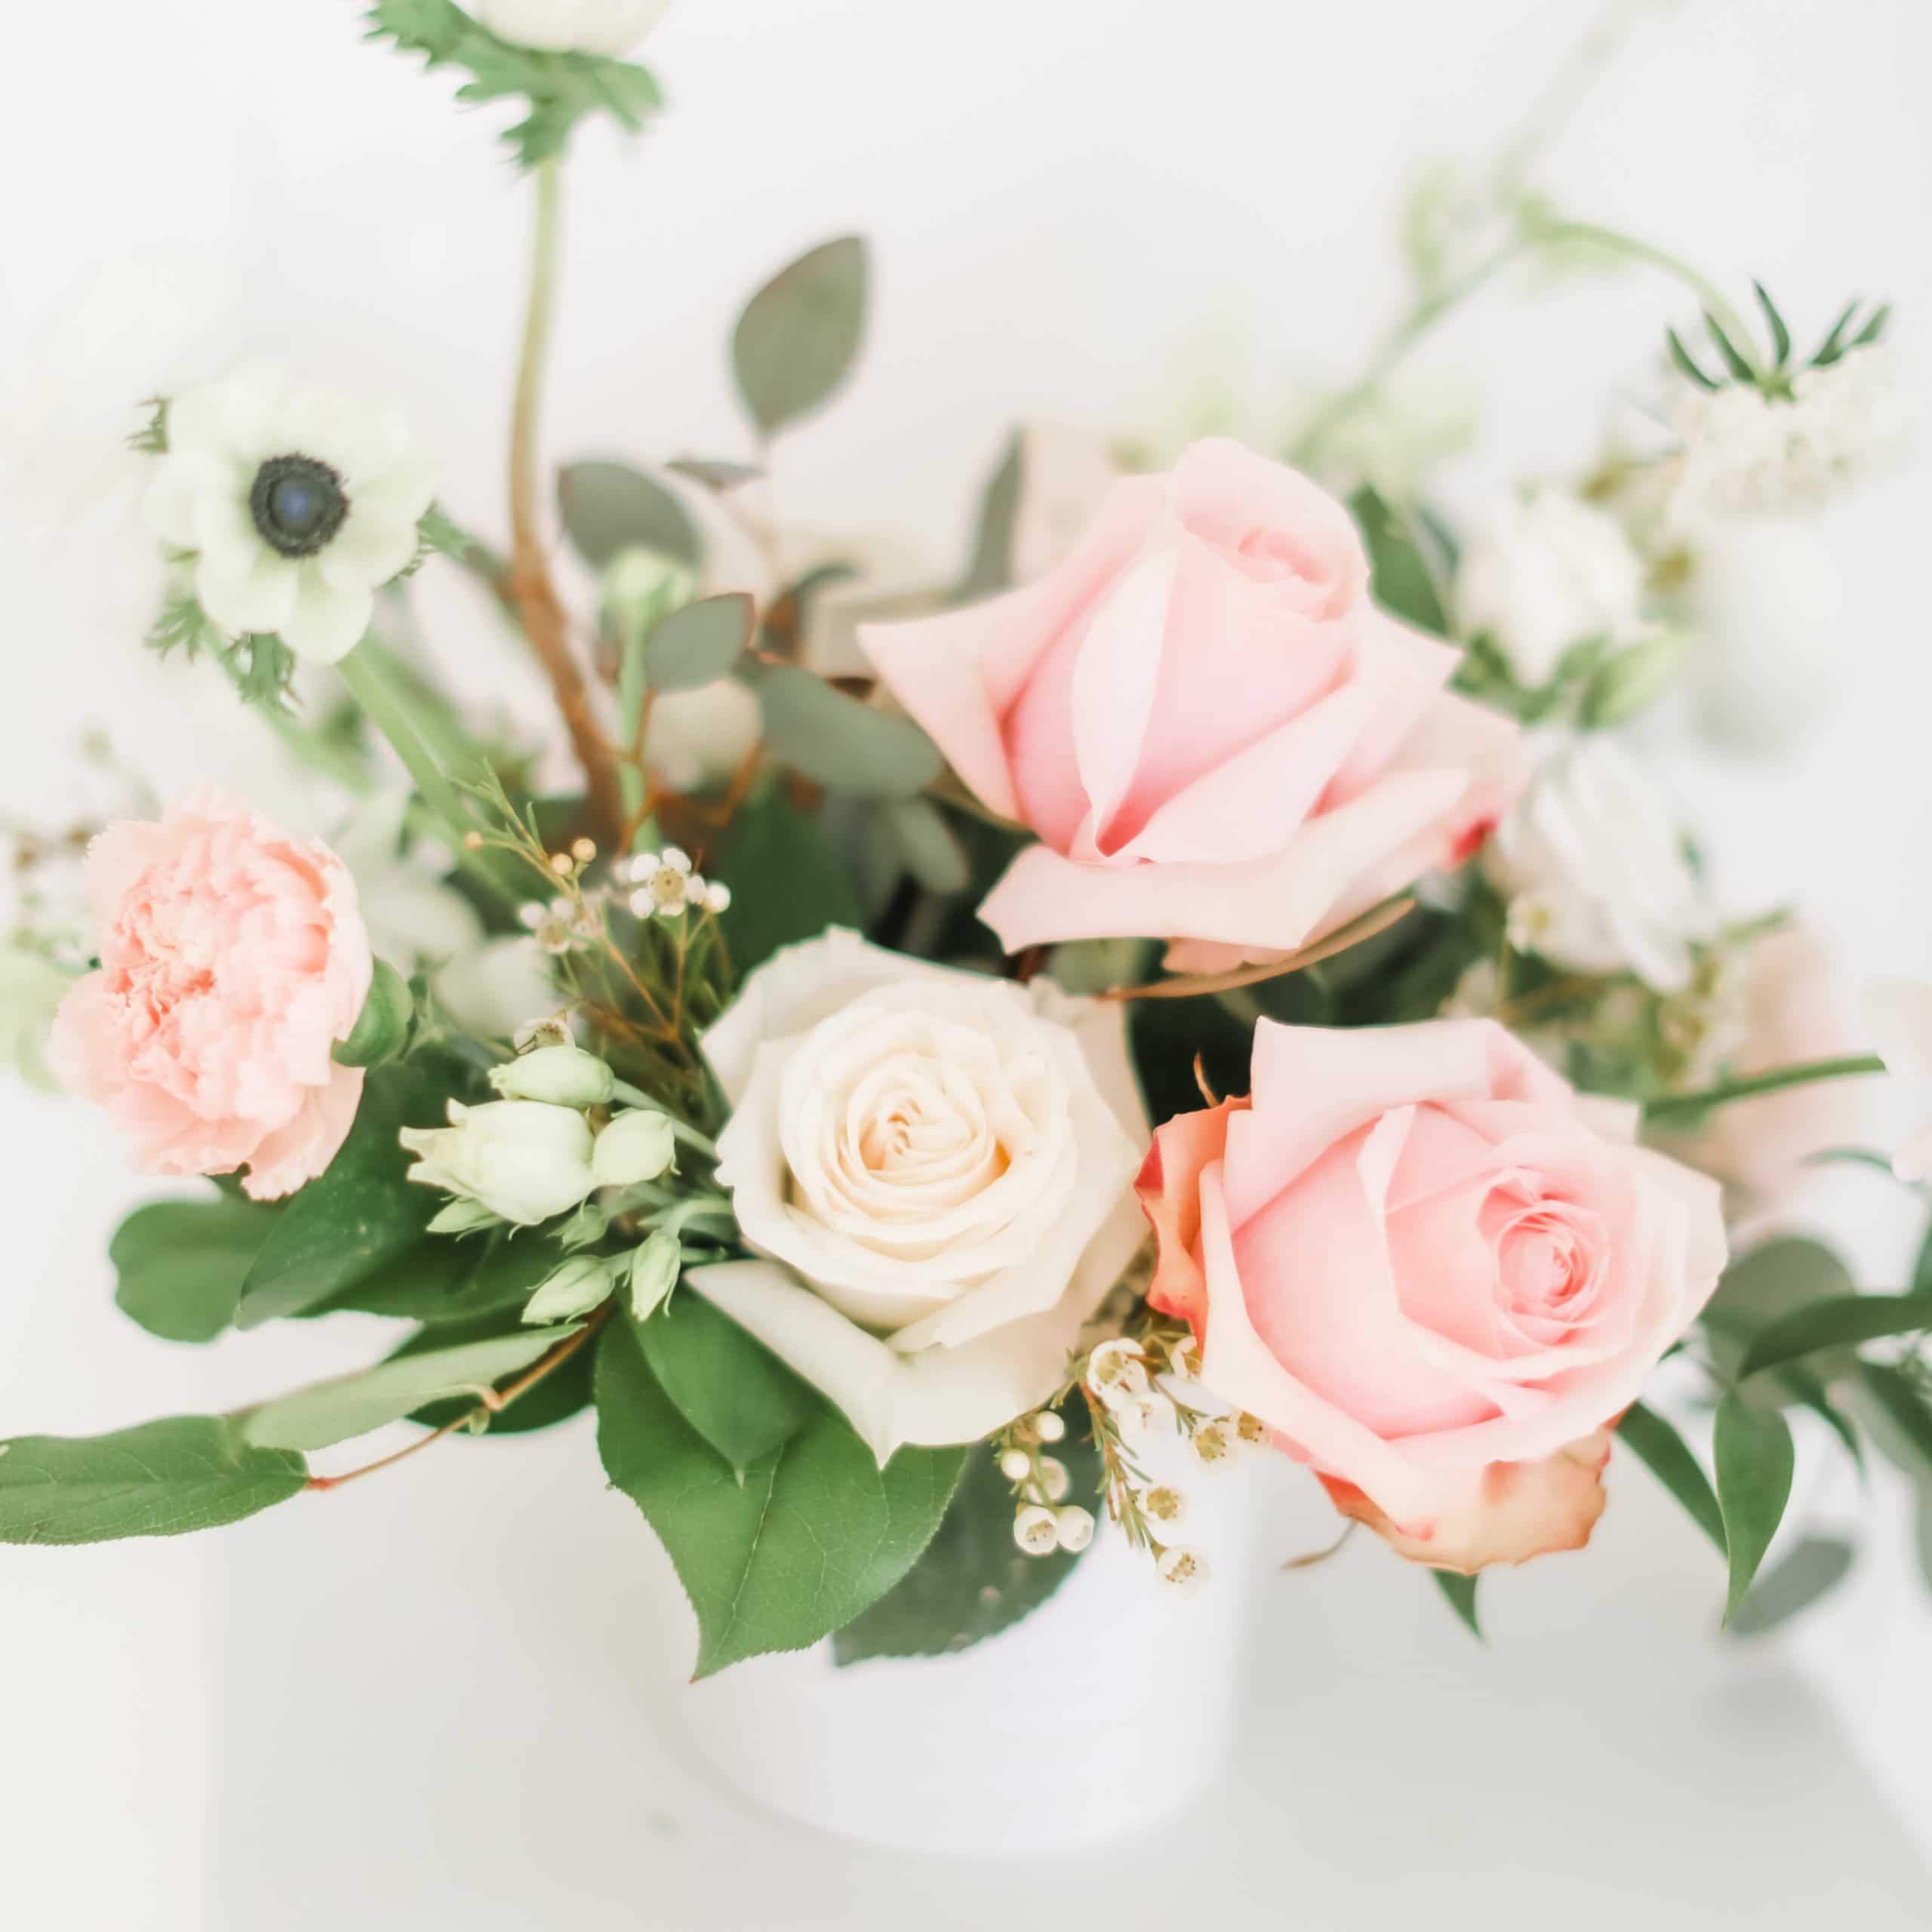 Blush Floral Centerpiece